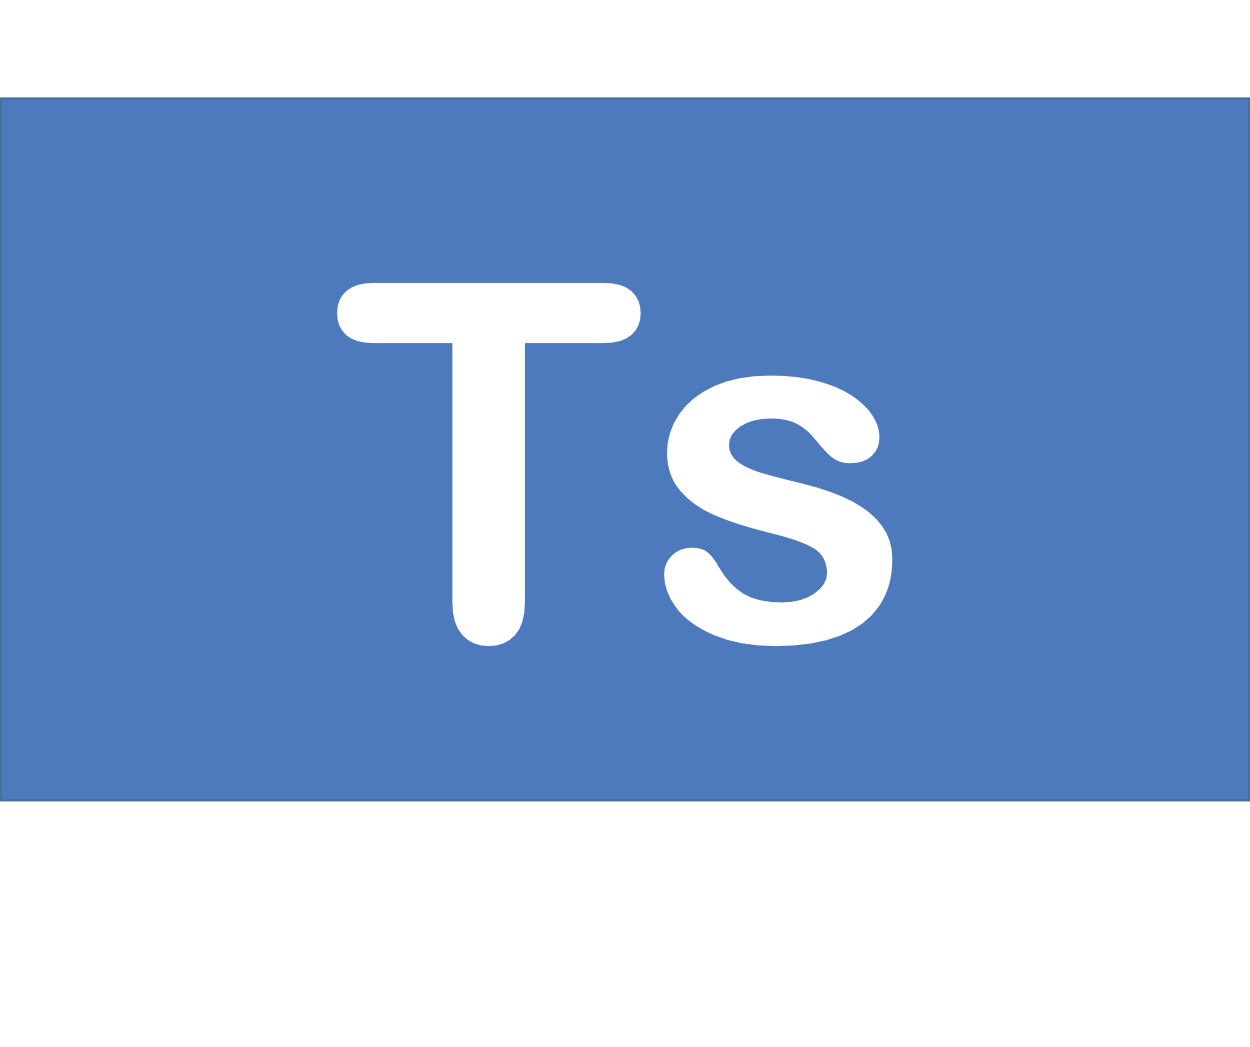 117 Ts テネシン Tennessine 元素 記号 周期表 化学 原子